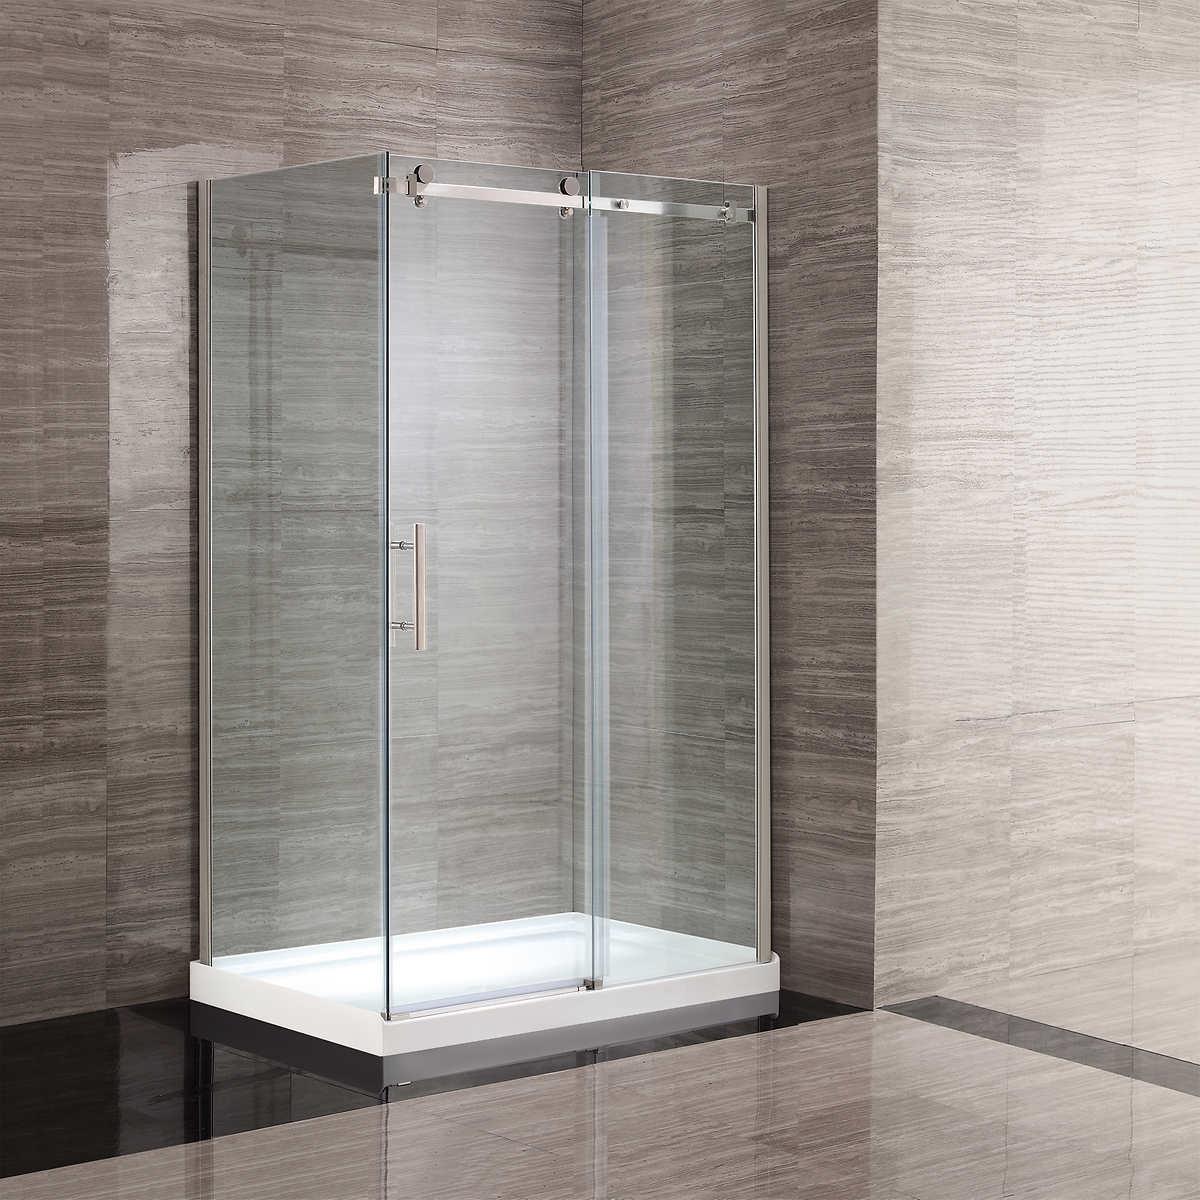 showers costco ove decors kelsey 48